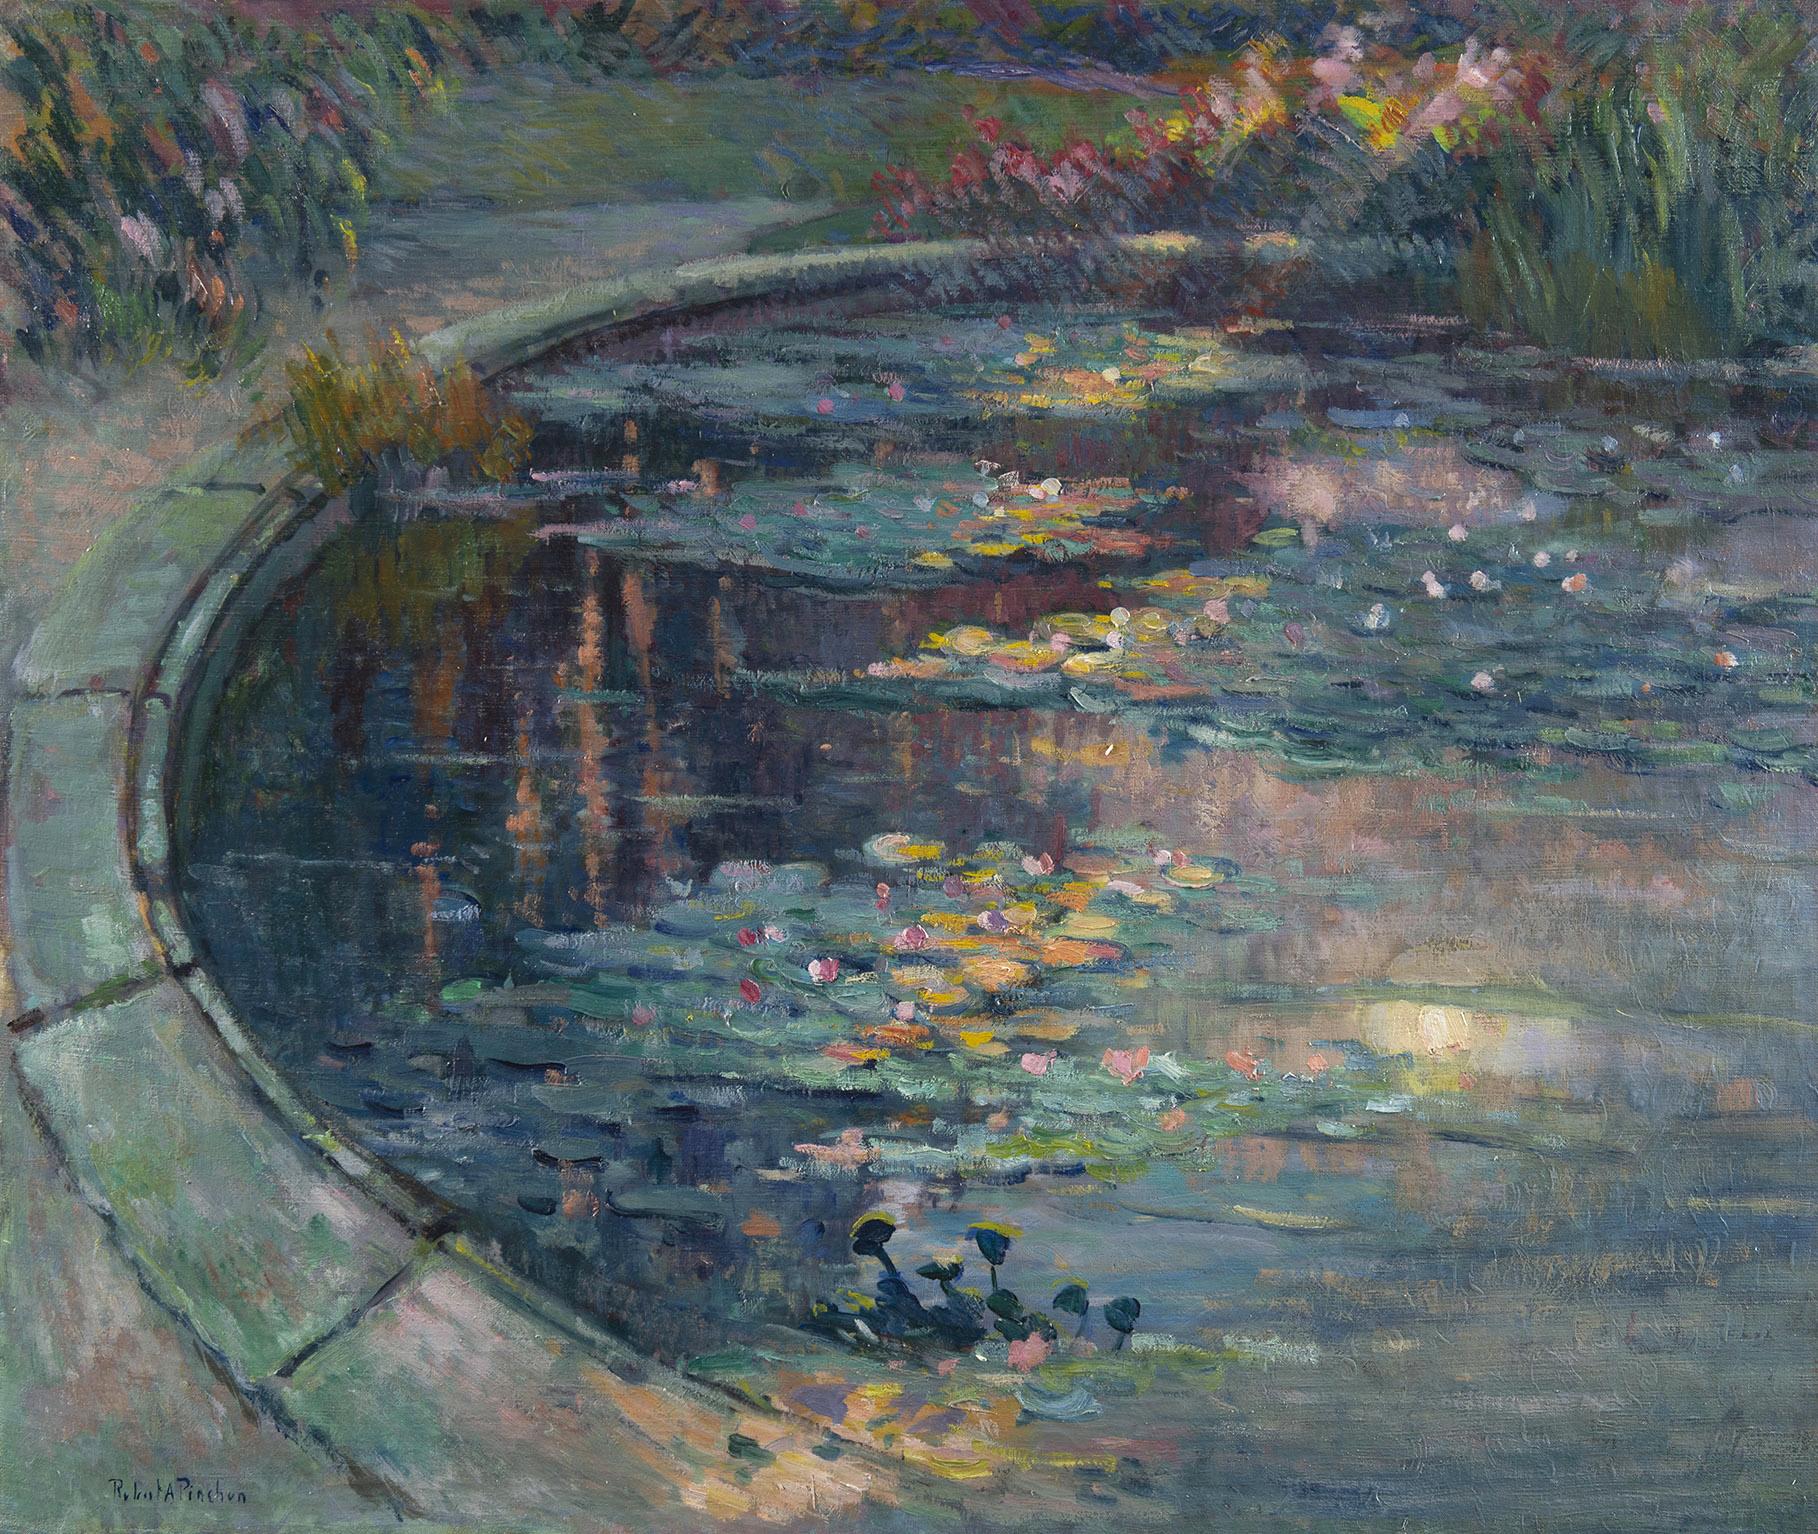 Helene Bailly Gallery - Paris tout Plante Bassin De Jardin